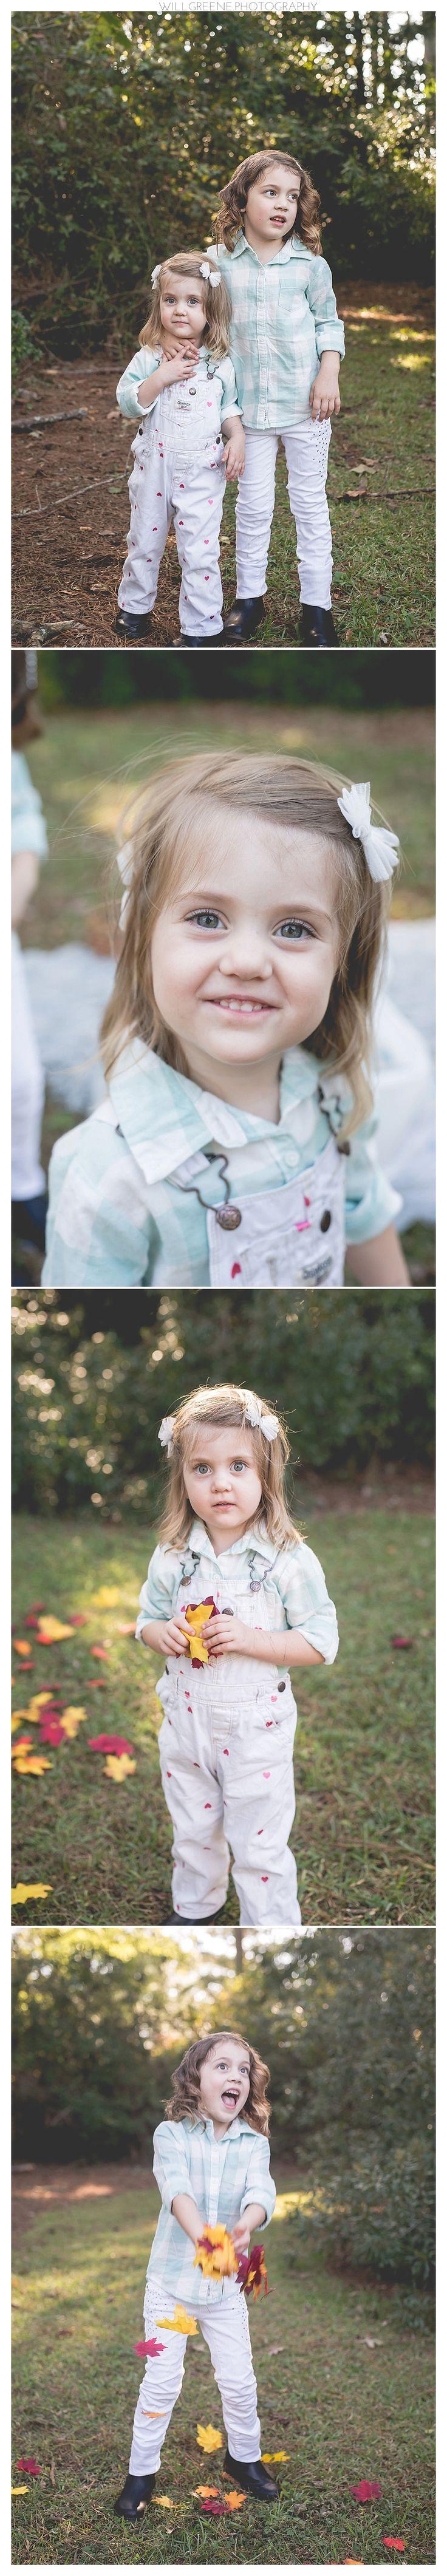 Jason, Heather, Emma, and Kaylee's family session, Farmville NC, Will Greene Photographer